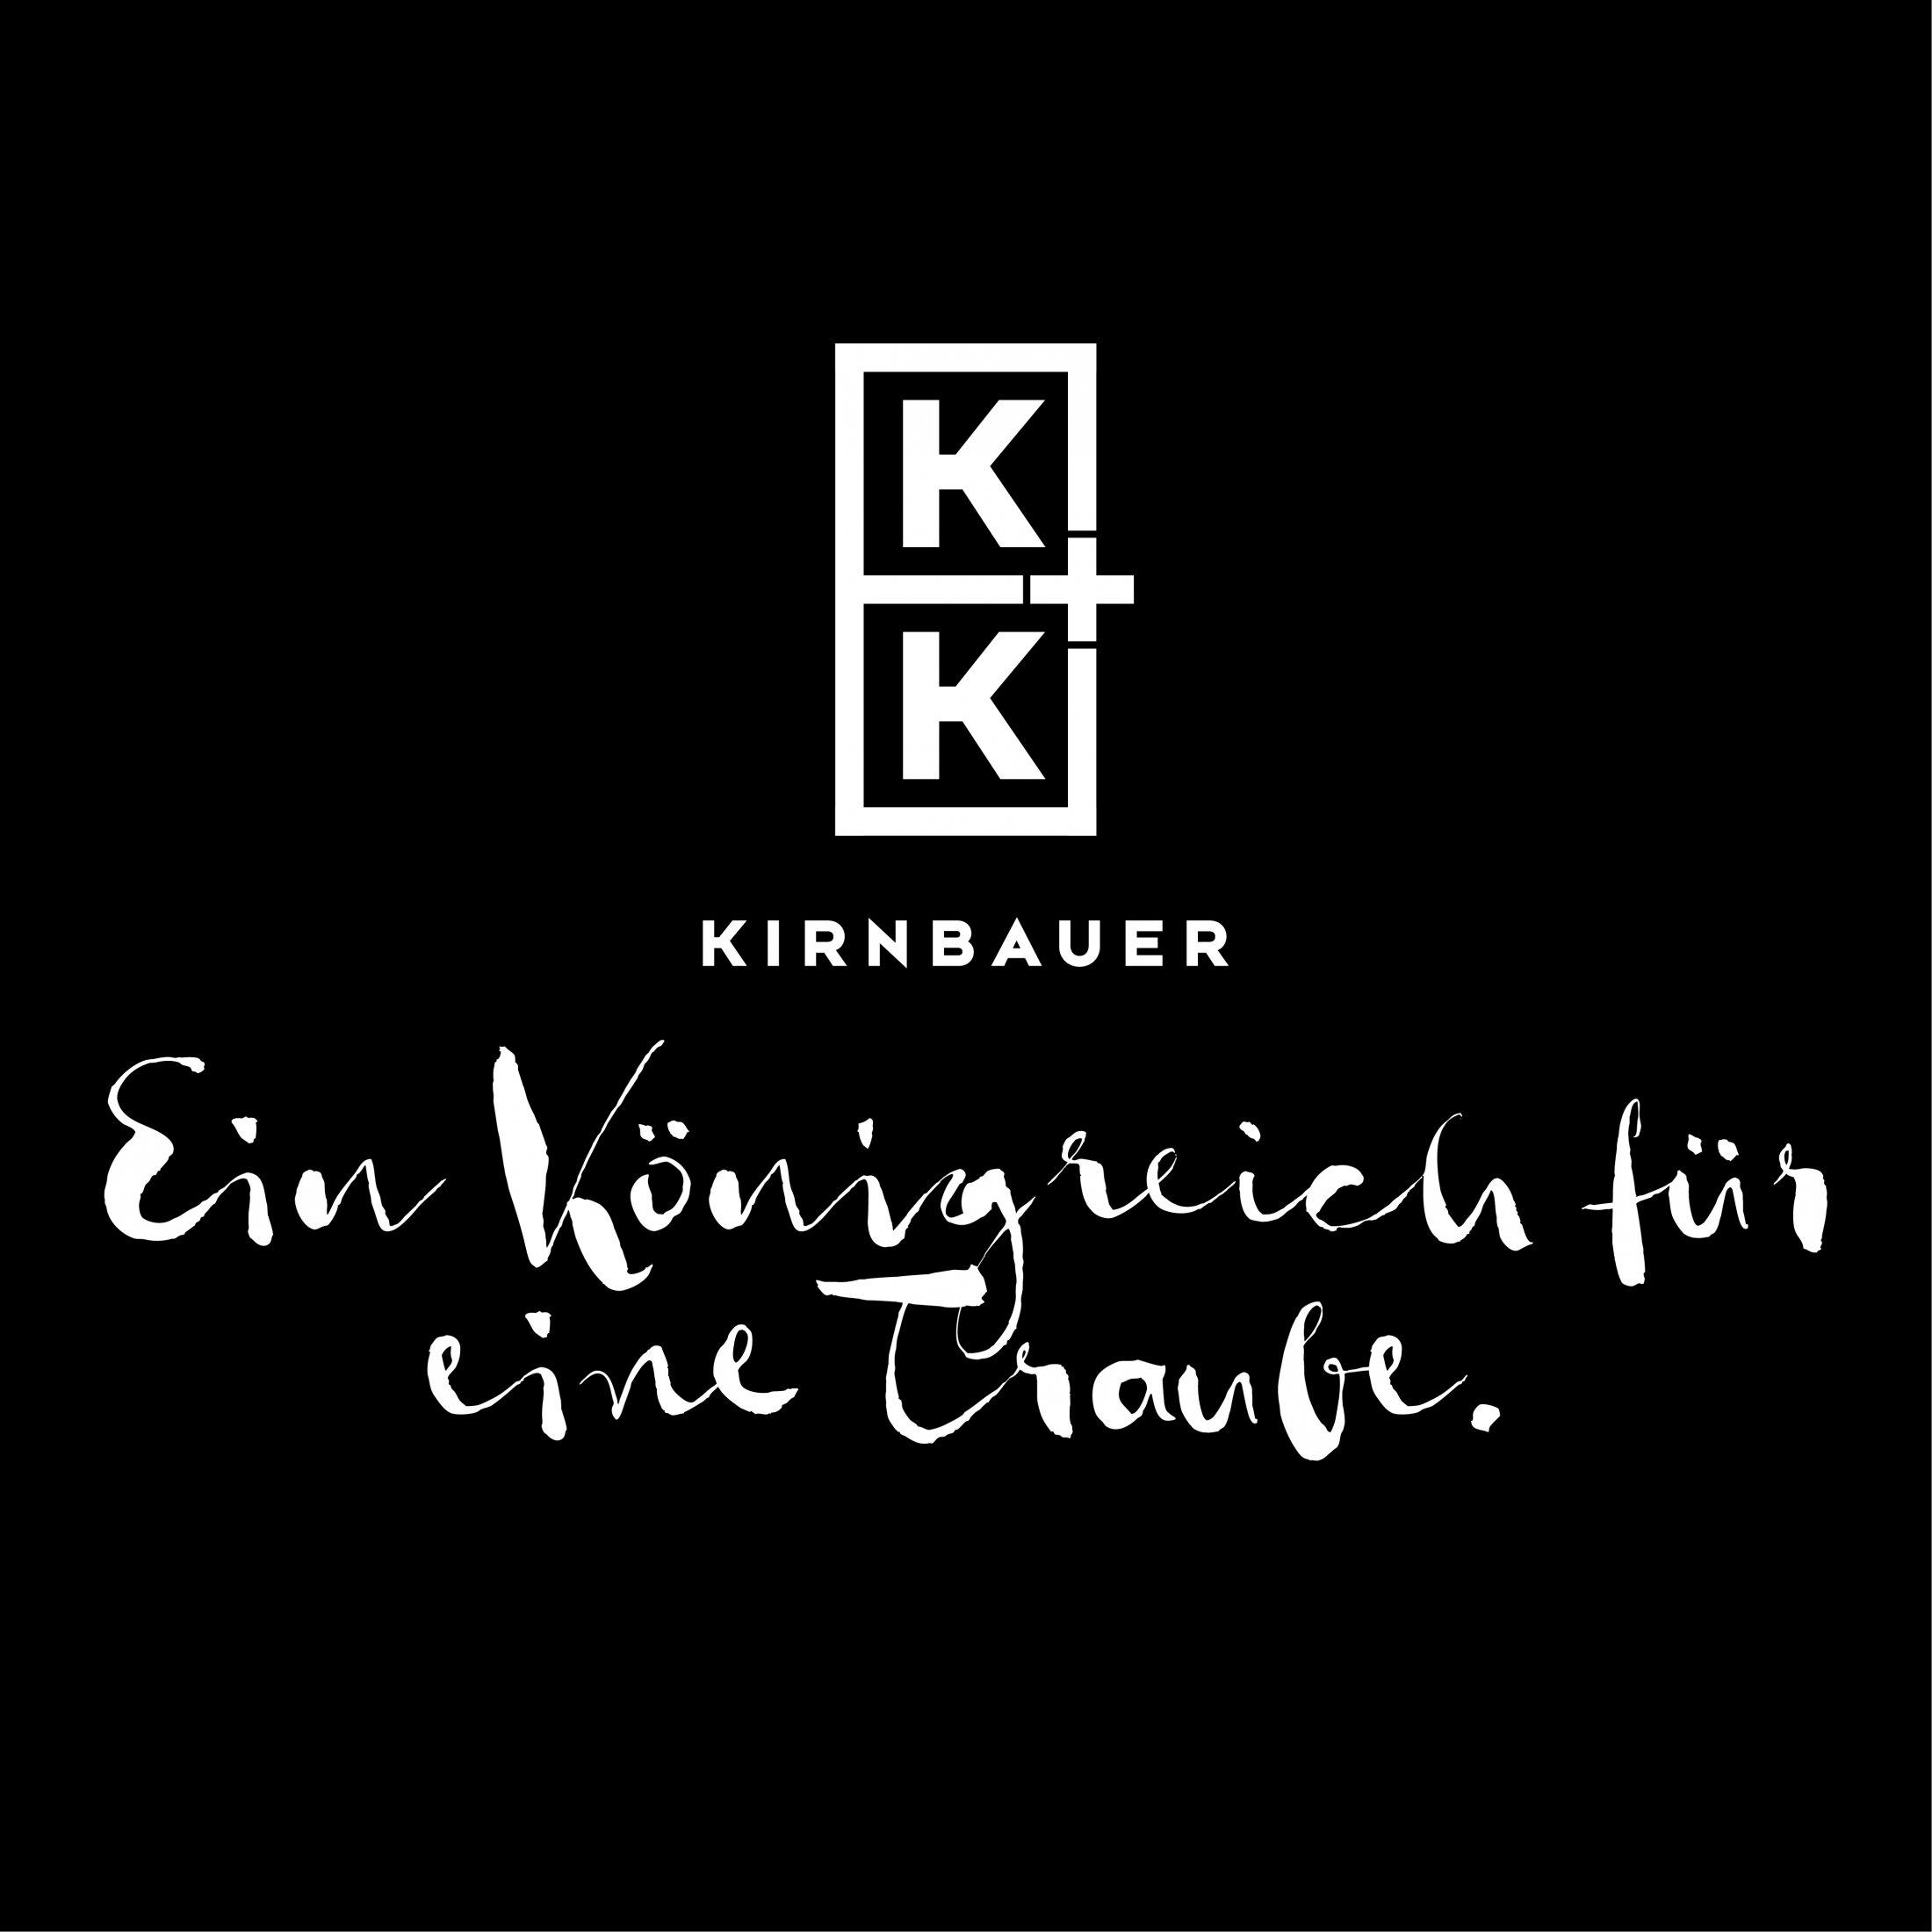 K+K-Kirnbauer Marke+Slogan A 1C Neg